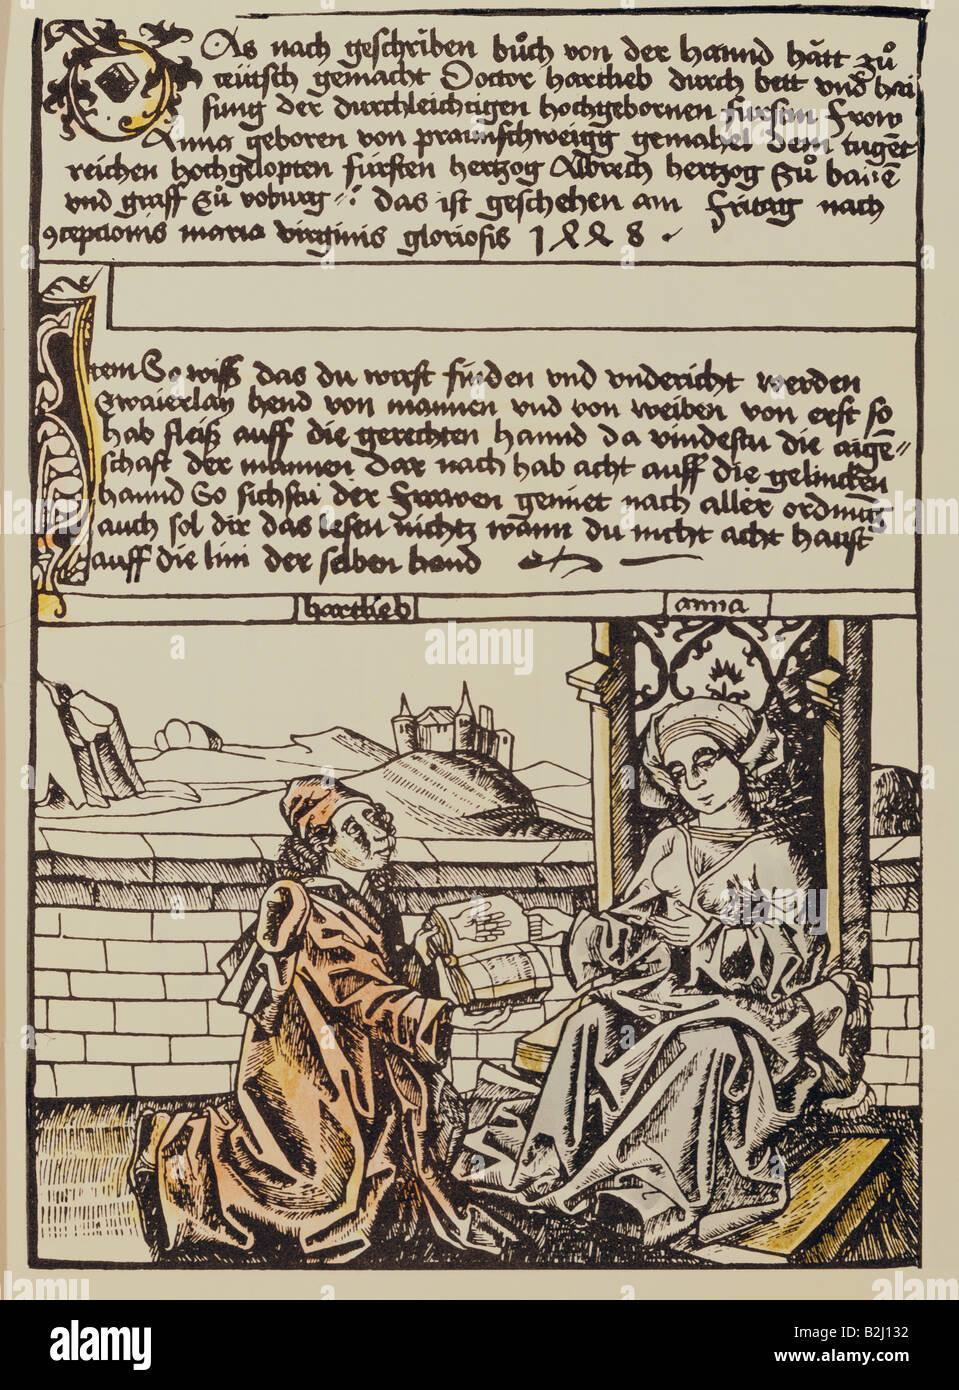 superstition, chiromancy, frontispiece, Anna, Duchess of Bavaria, from 'Chiromantie' (Chiromancy),  part - Stock Image